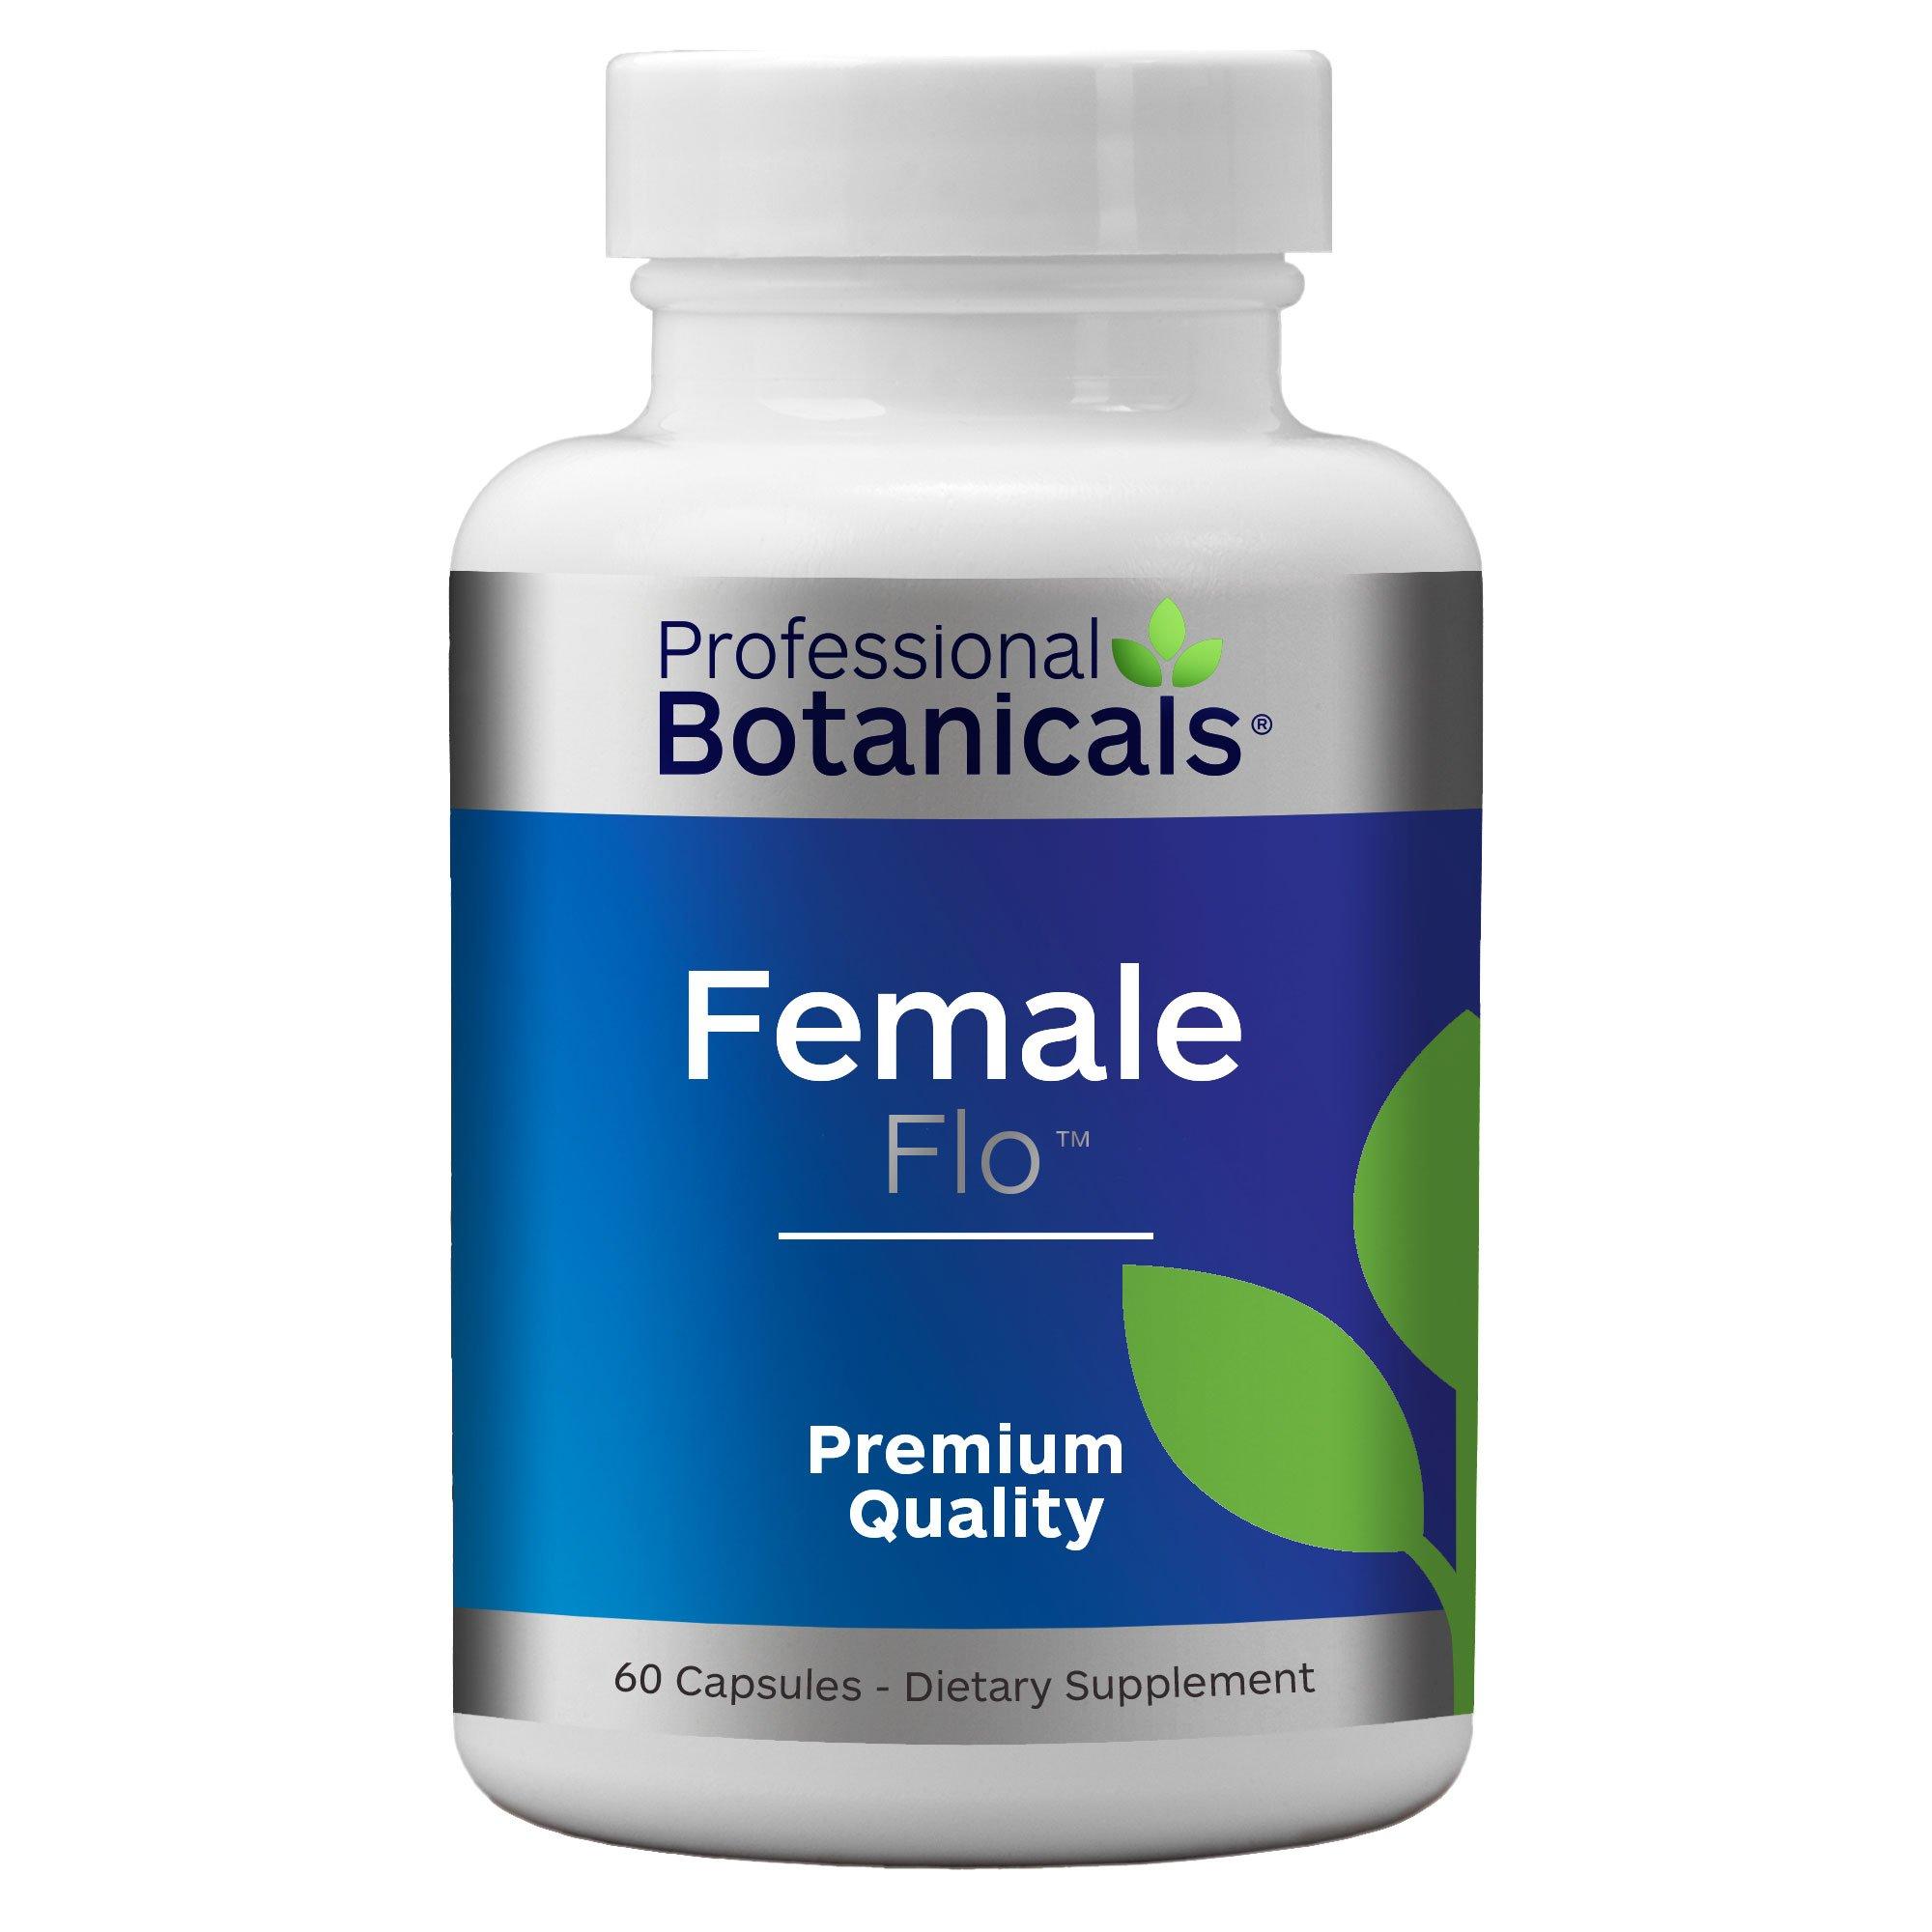 Professional Botanicals Female Flo - Vegan Natural Herbal Menstrual PMS Relief Supplement Helps Relieve Bloating and Cramping - 60 Vegetarian Capsules